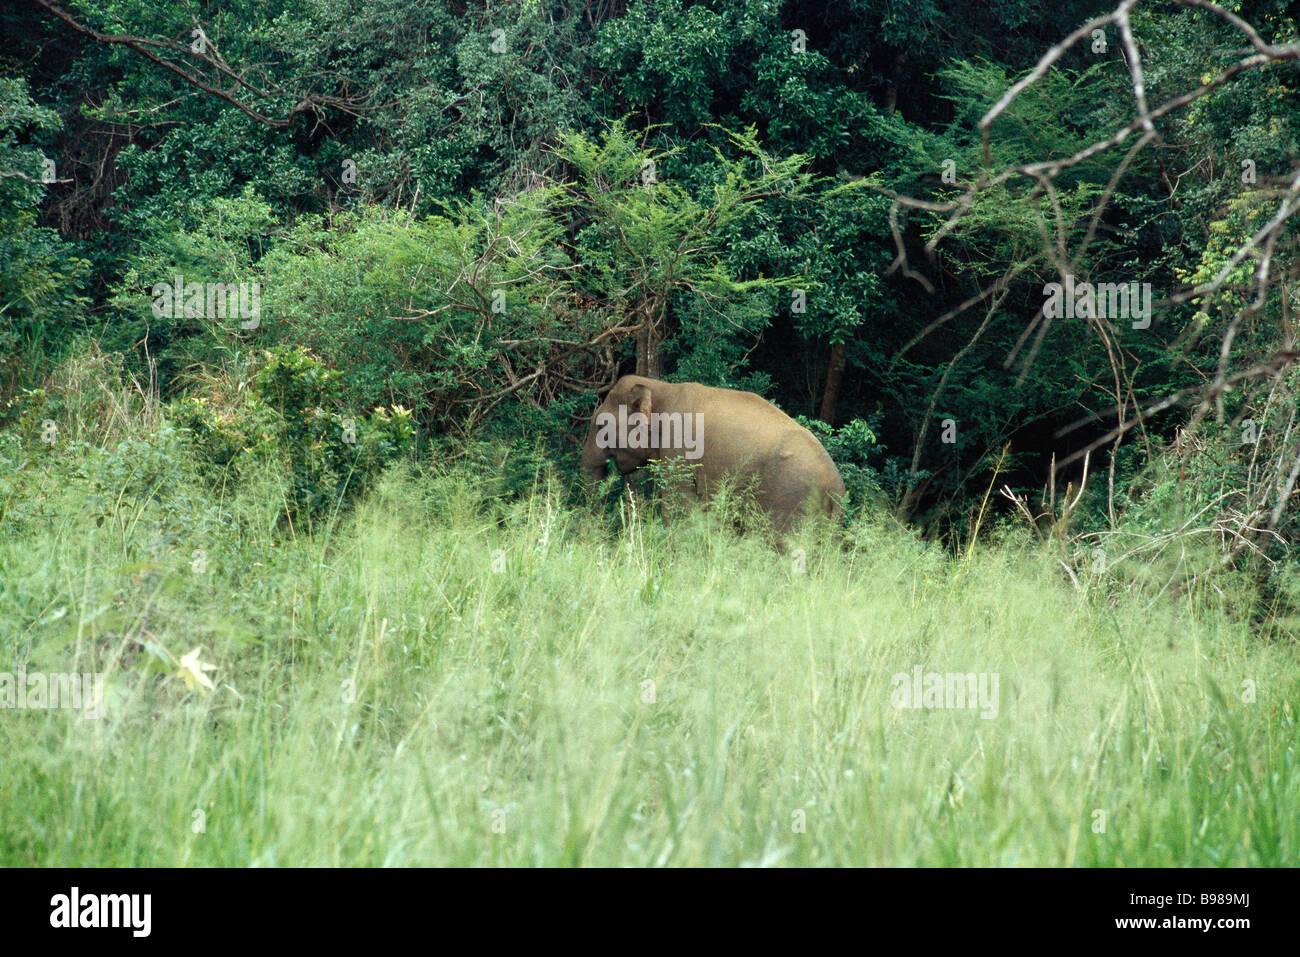 Sri Lankan Elephant grazing in forest meadow - Stock Image